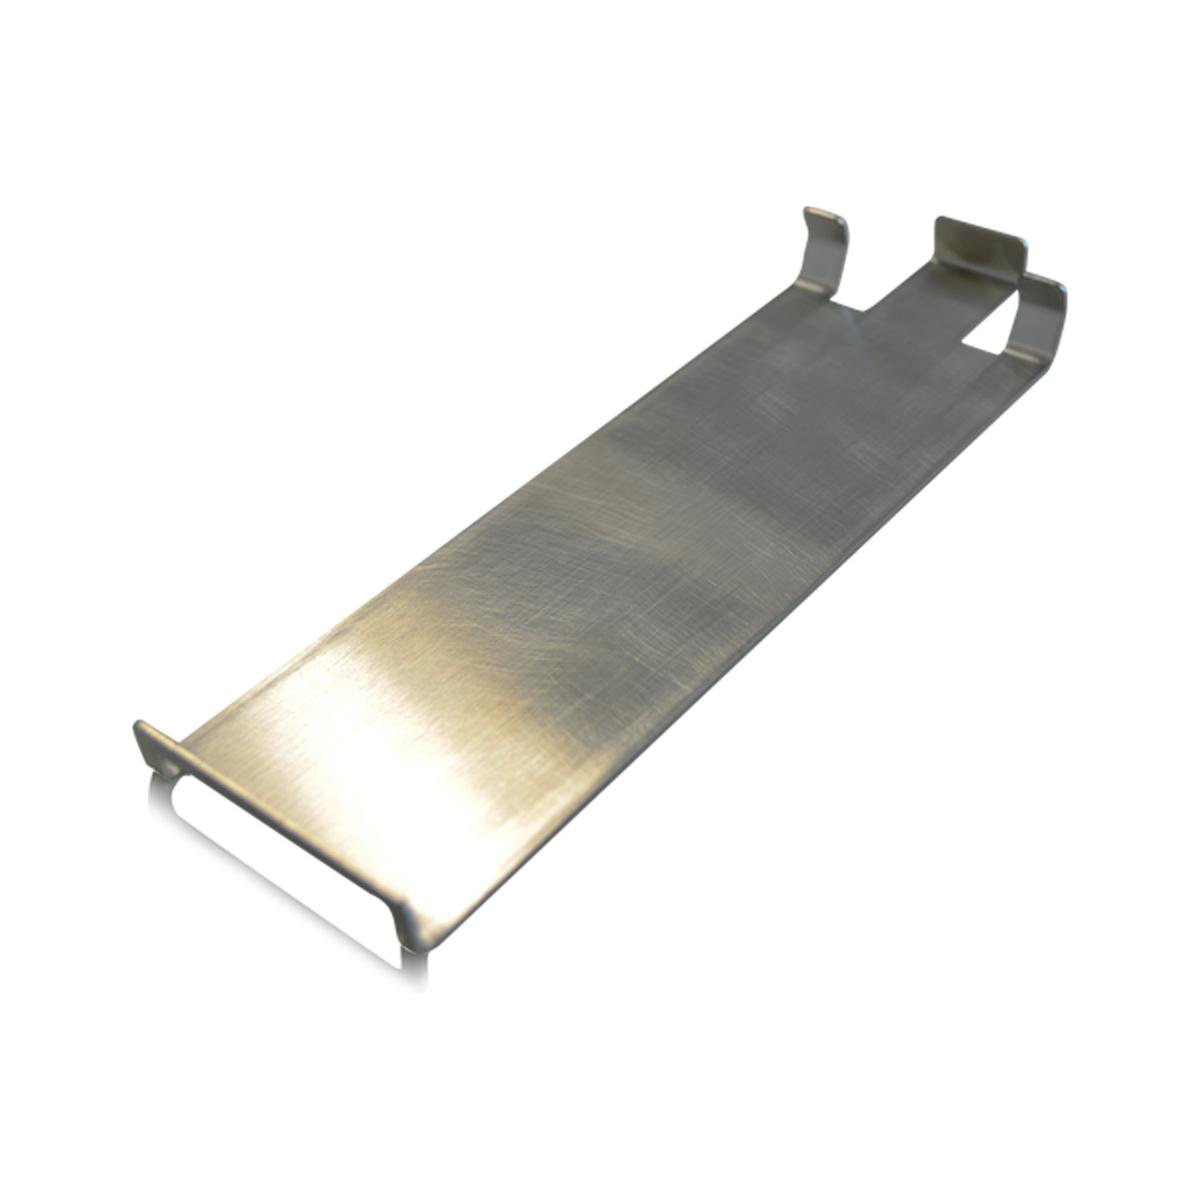 Accessori Accessori Uptec SUPACLPB Profilitec